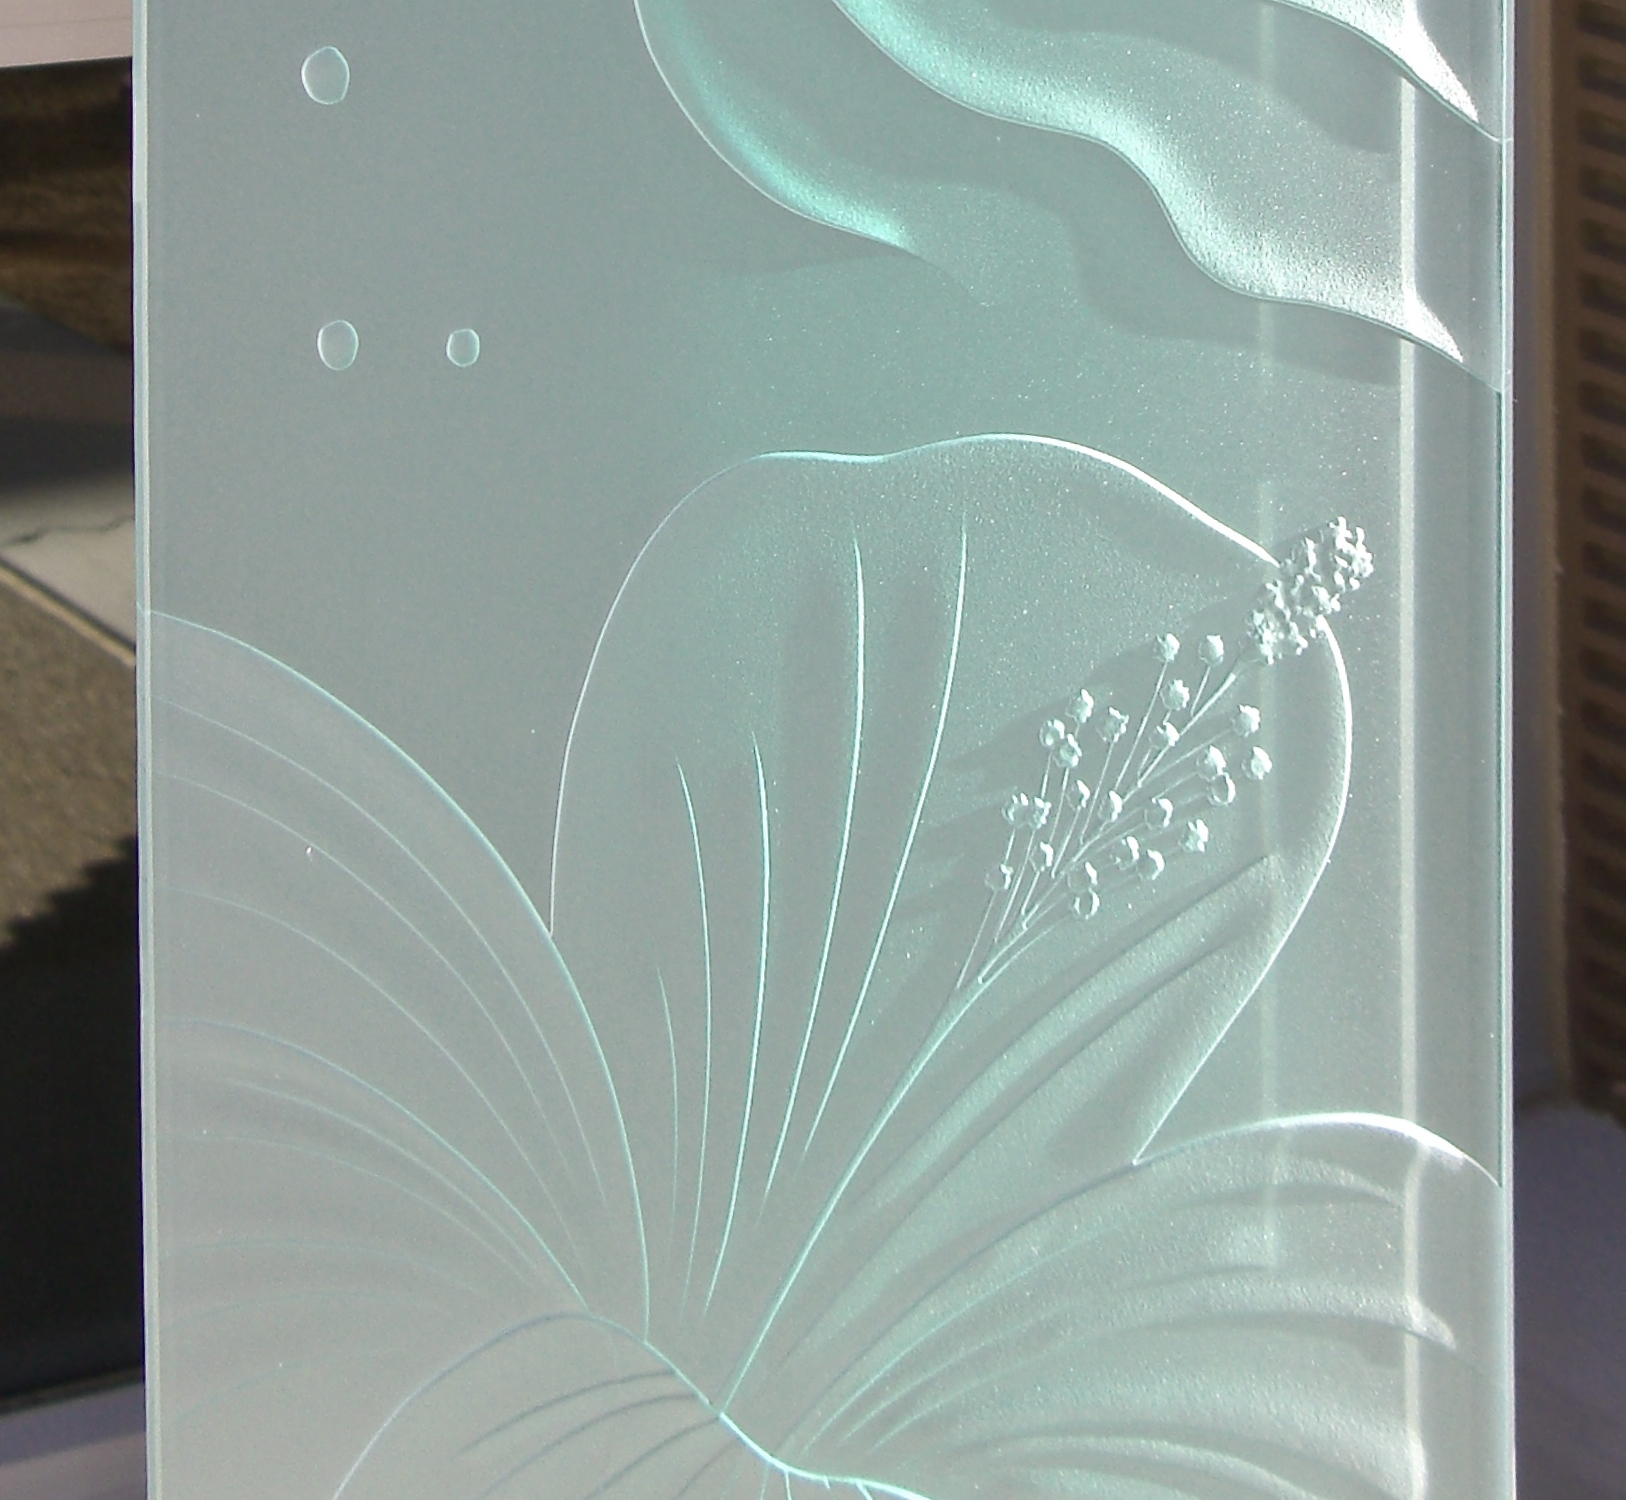 3d Shelves Wallpaper Hibiscus Waves 3d Etched Glass Window Panels